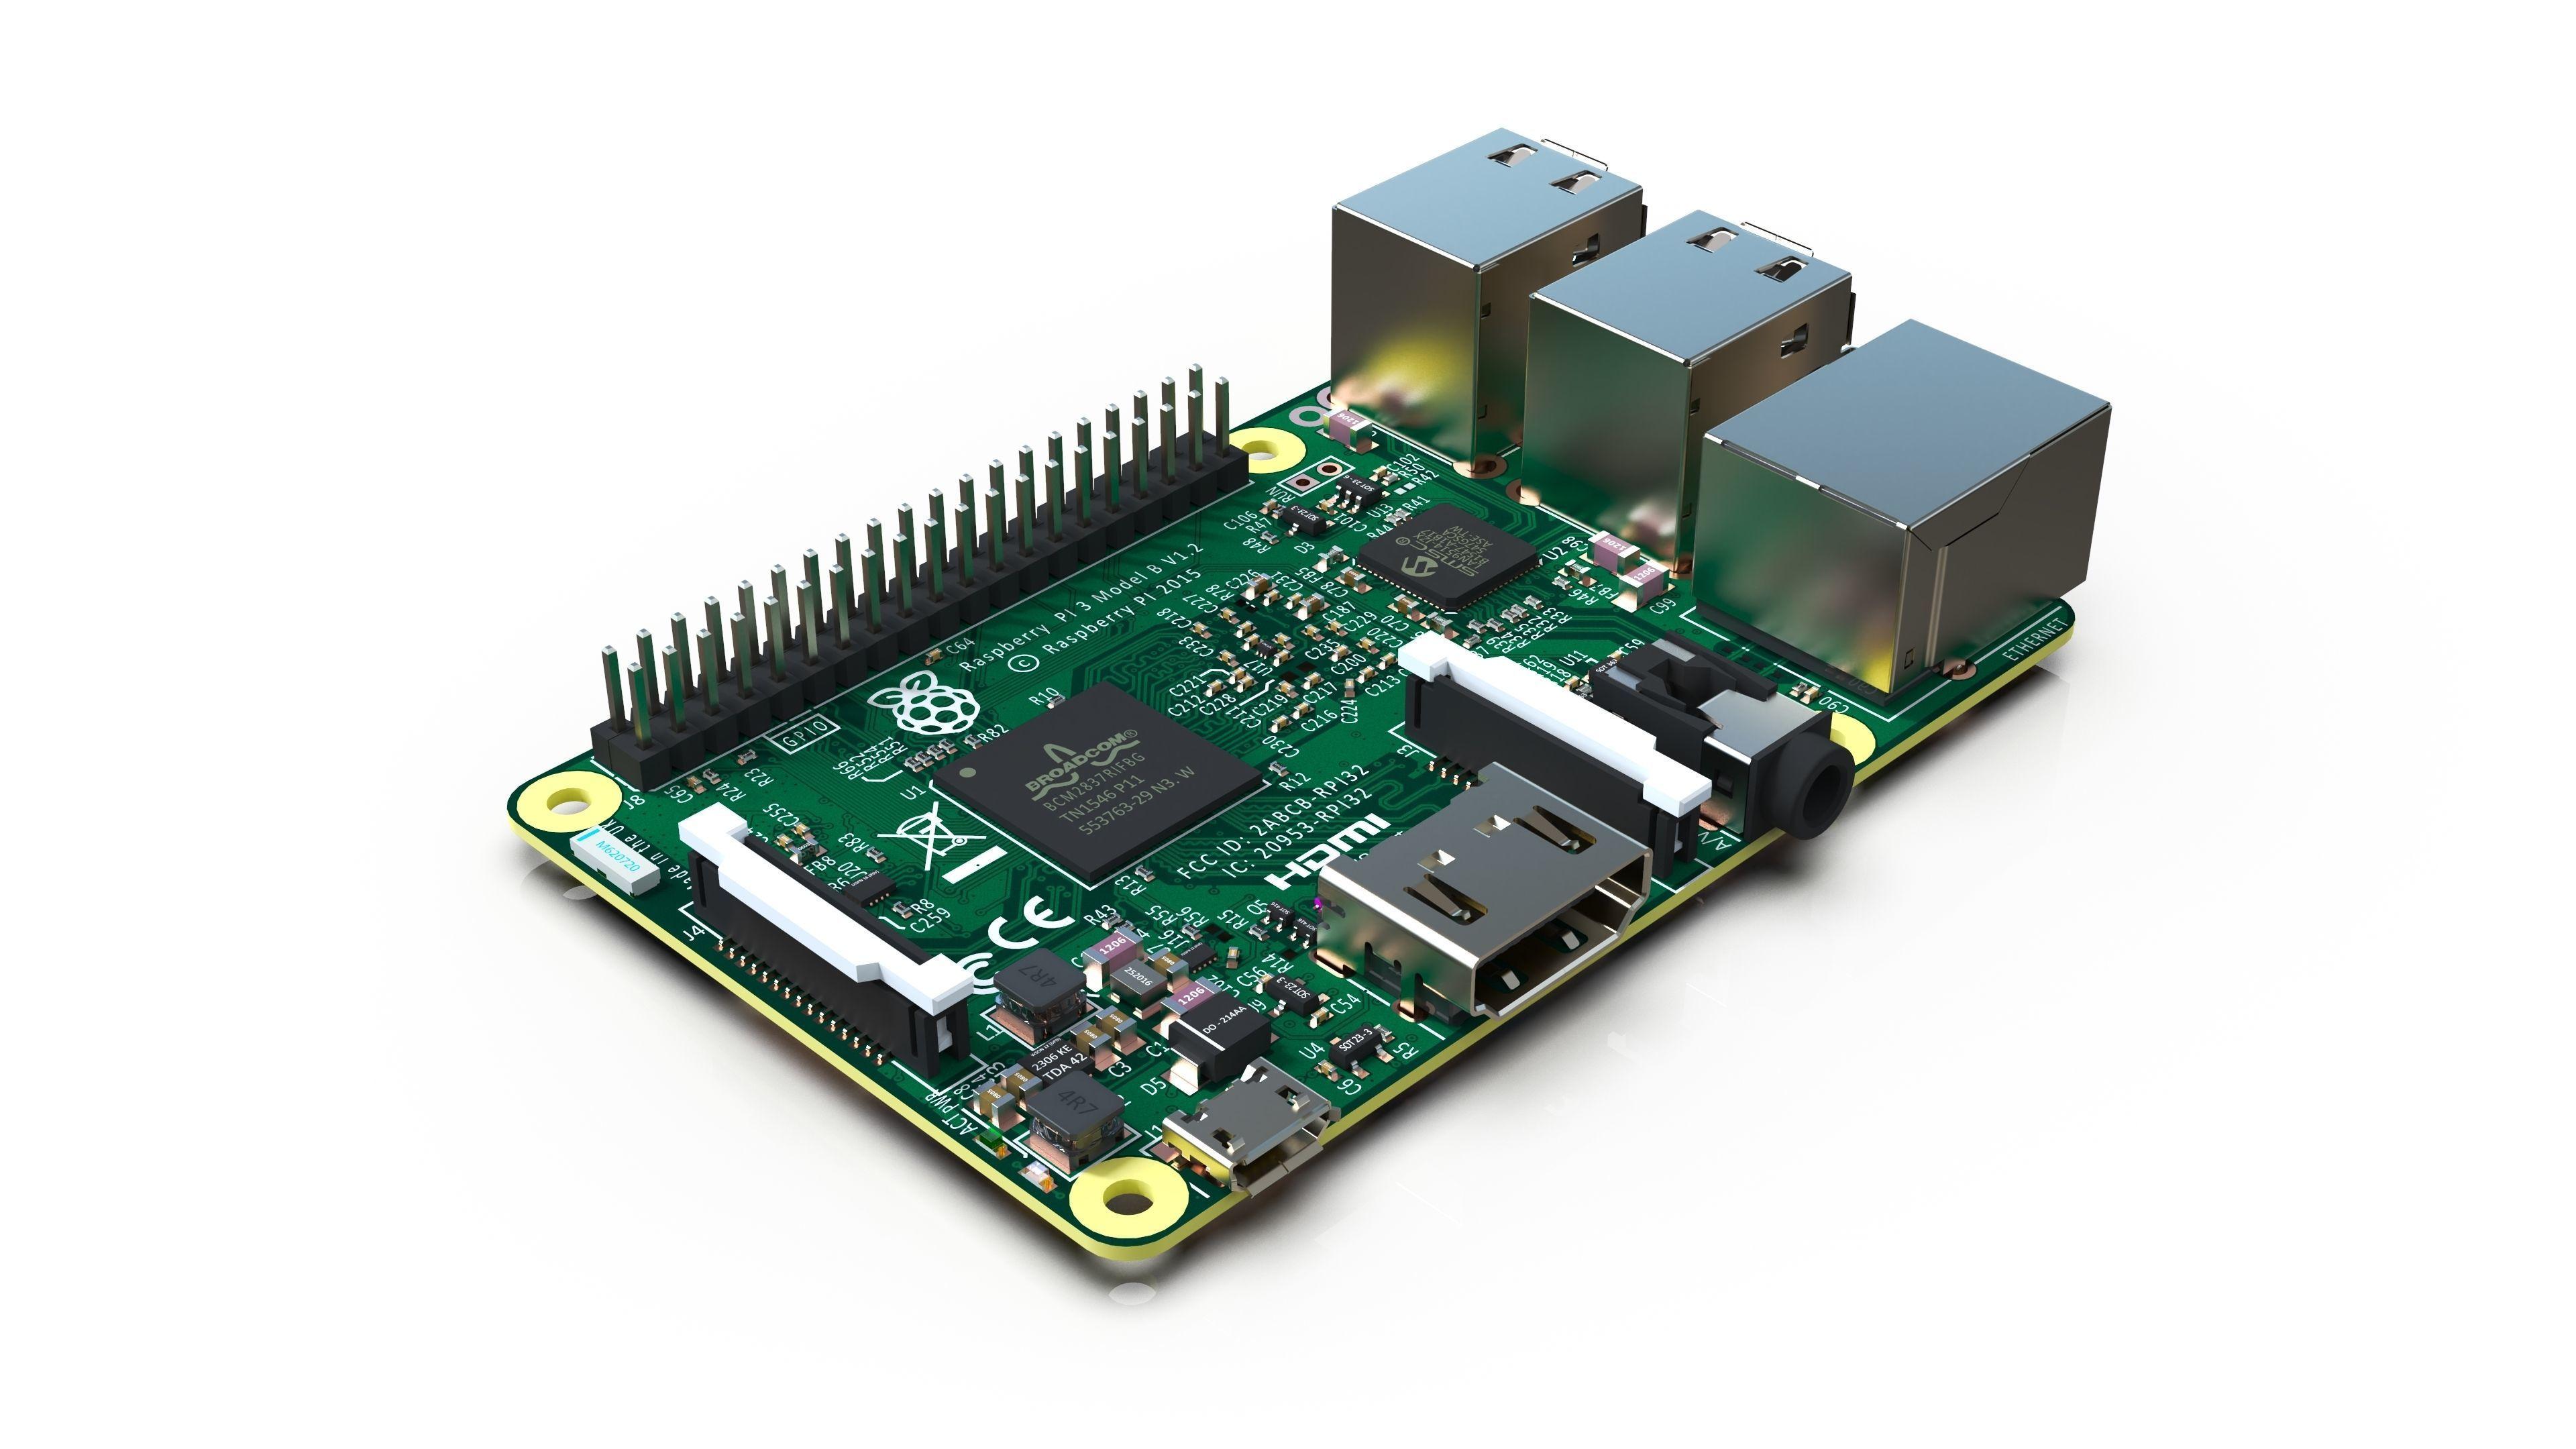 Raspberry Pi 3 model B - Reverse engineering